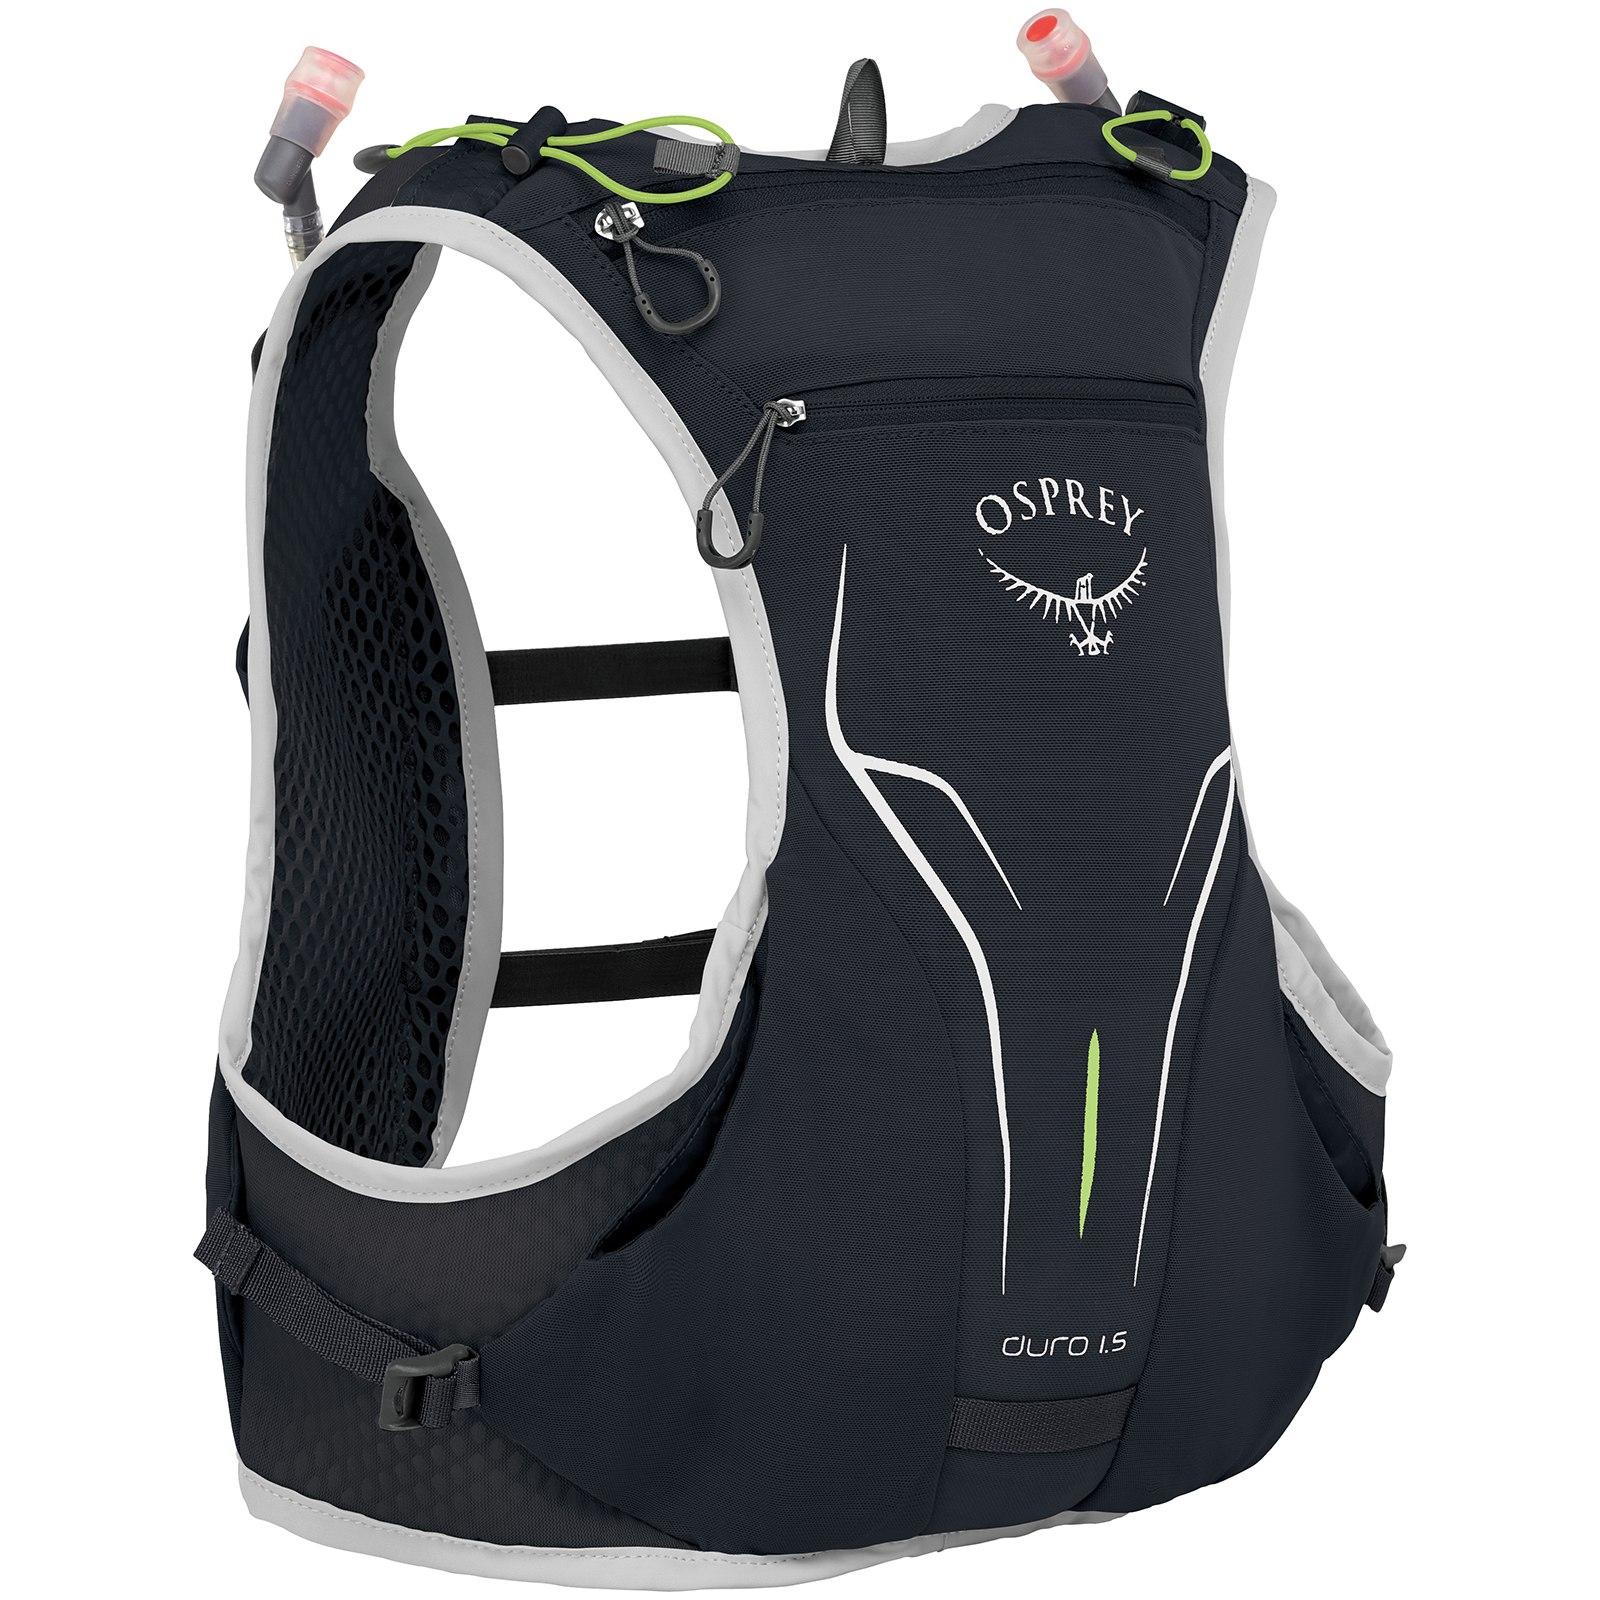 Osprey Duro 1.5 Running Backpack - Alpine Black